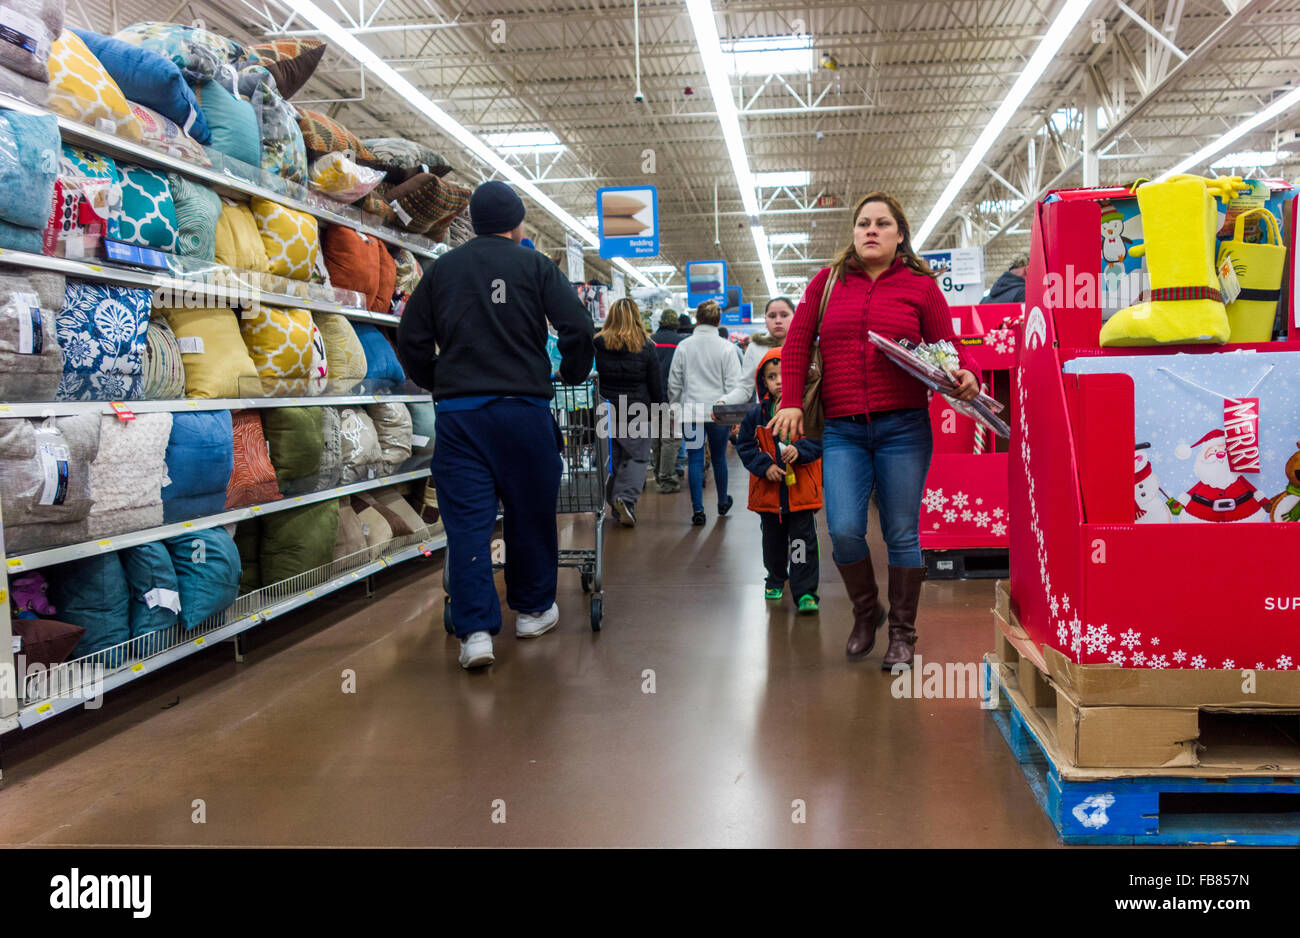 post-Christmas shoppers, Walmart Store, Pasco, Washington State, USA - Stock Image